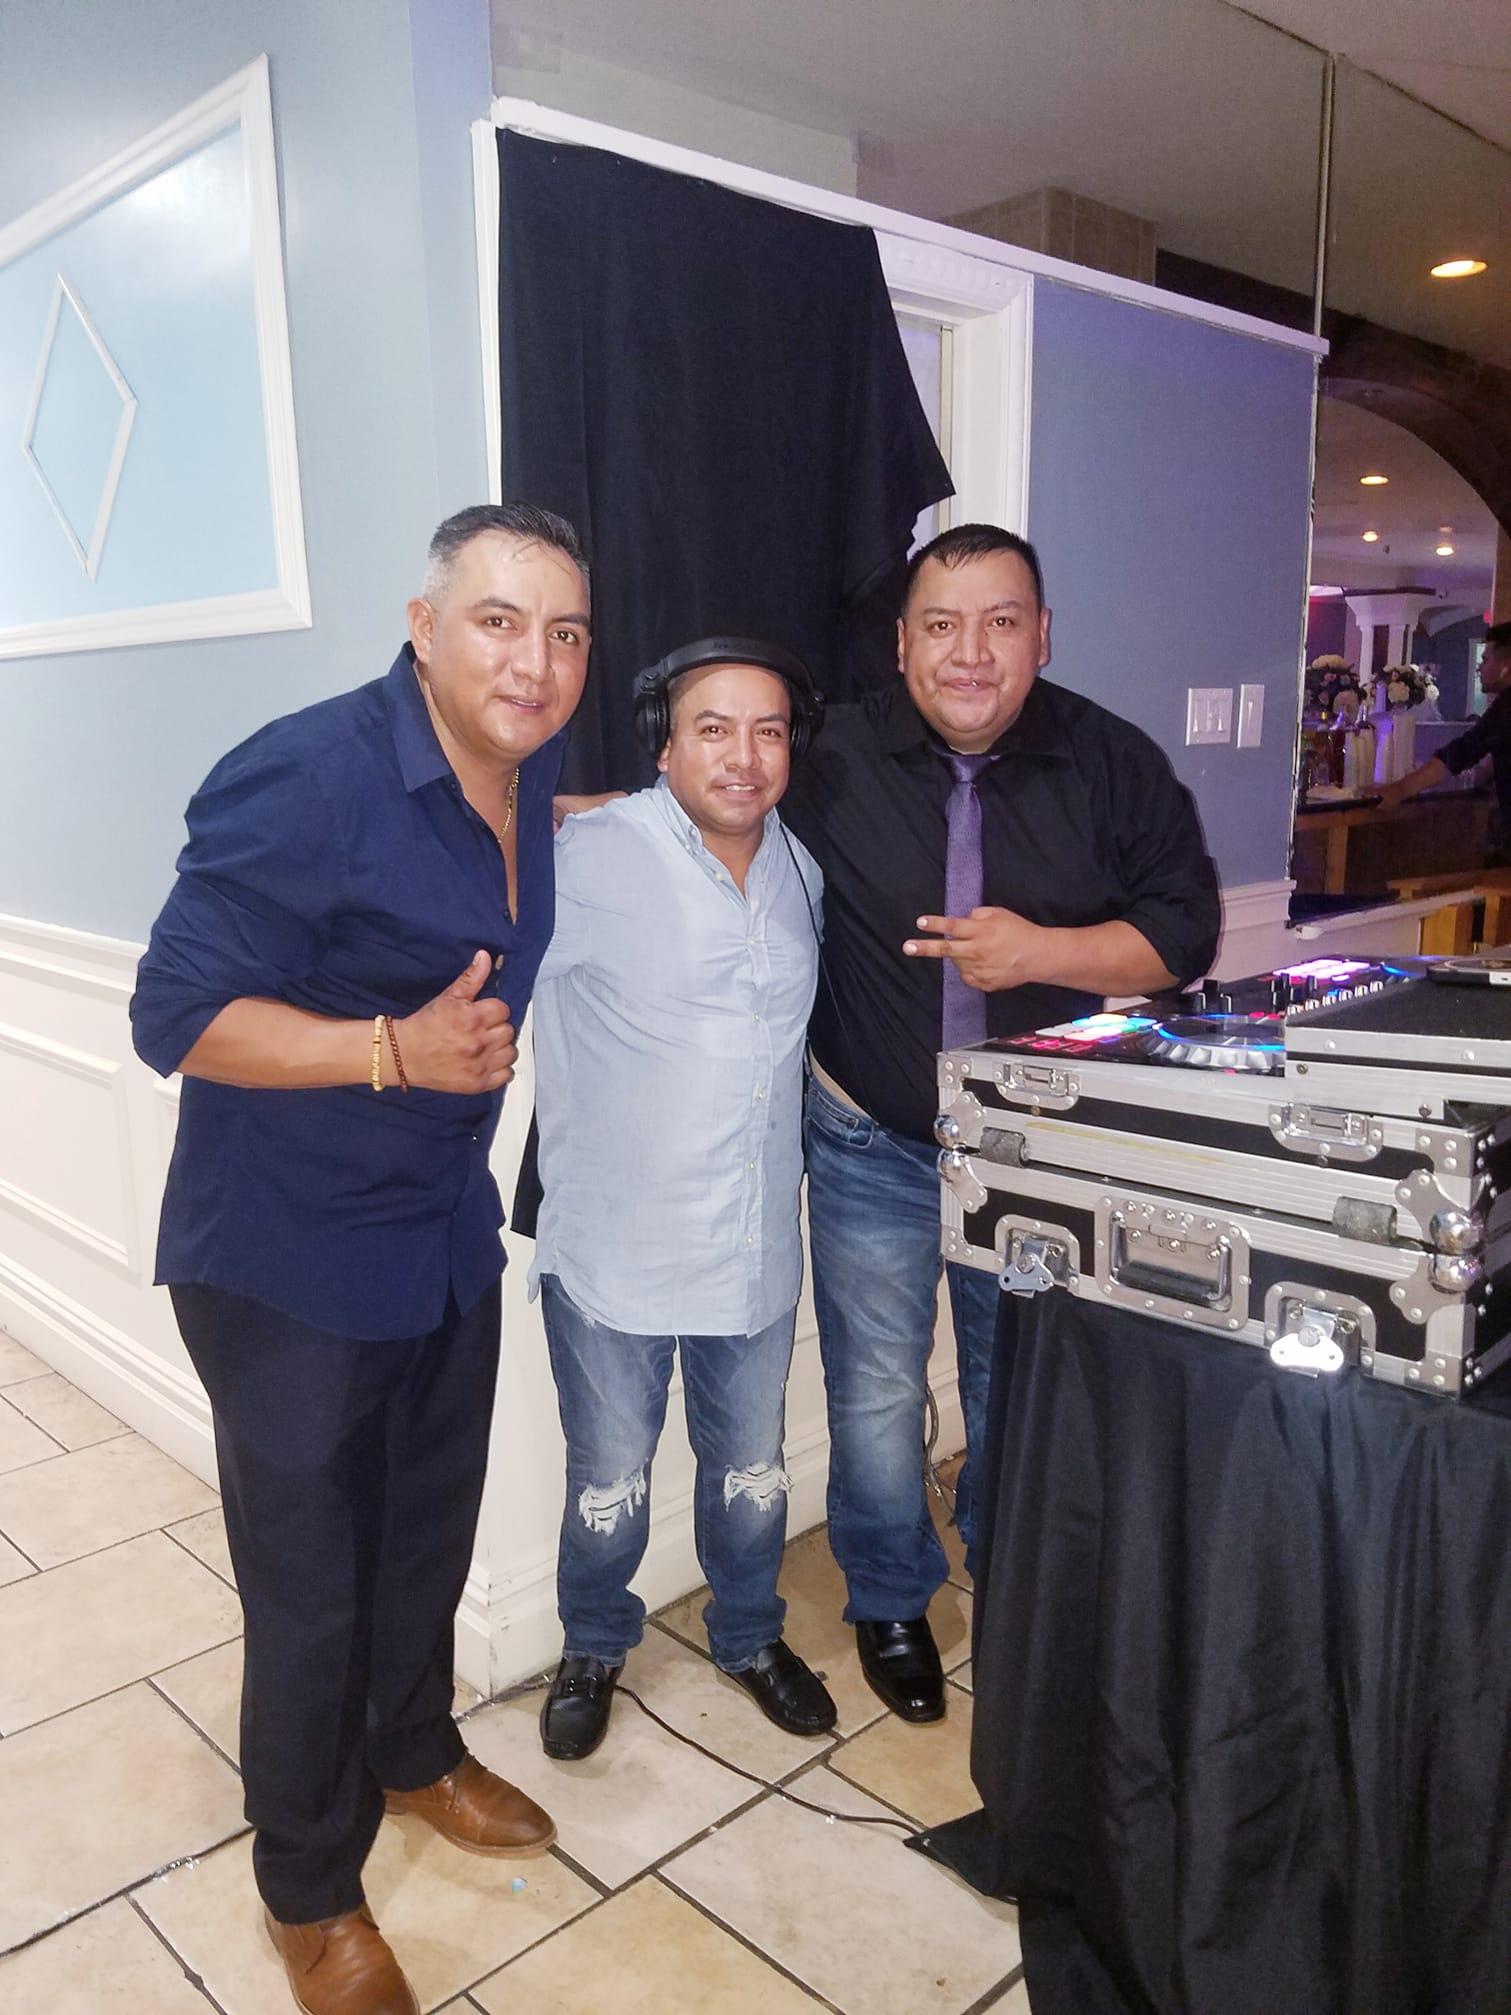 Patrick DJ